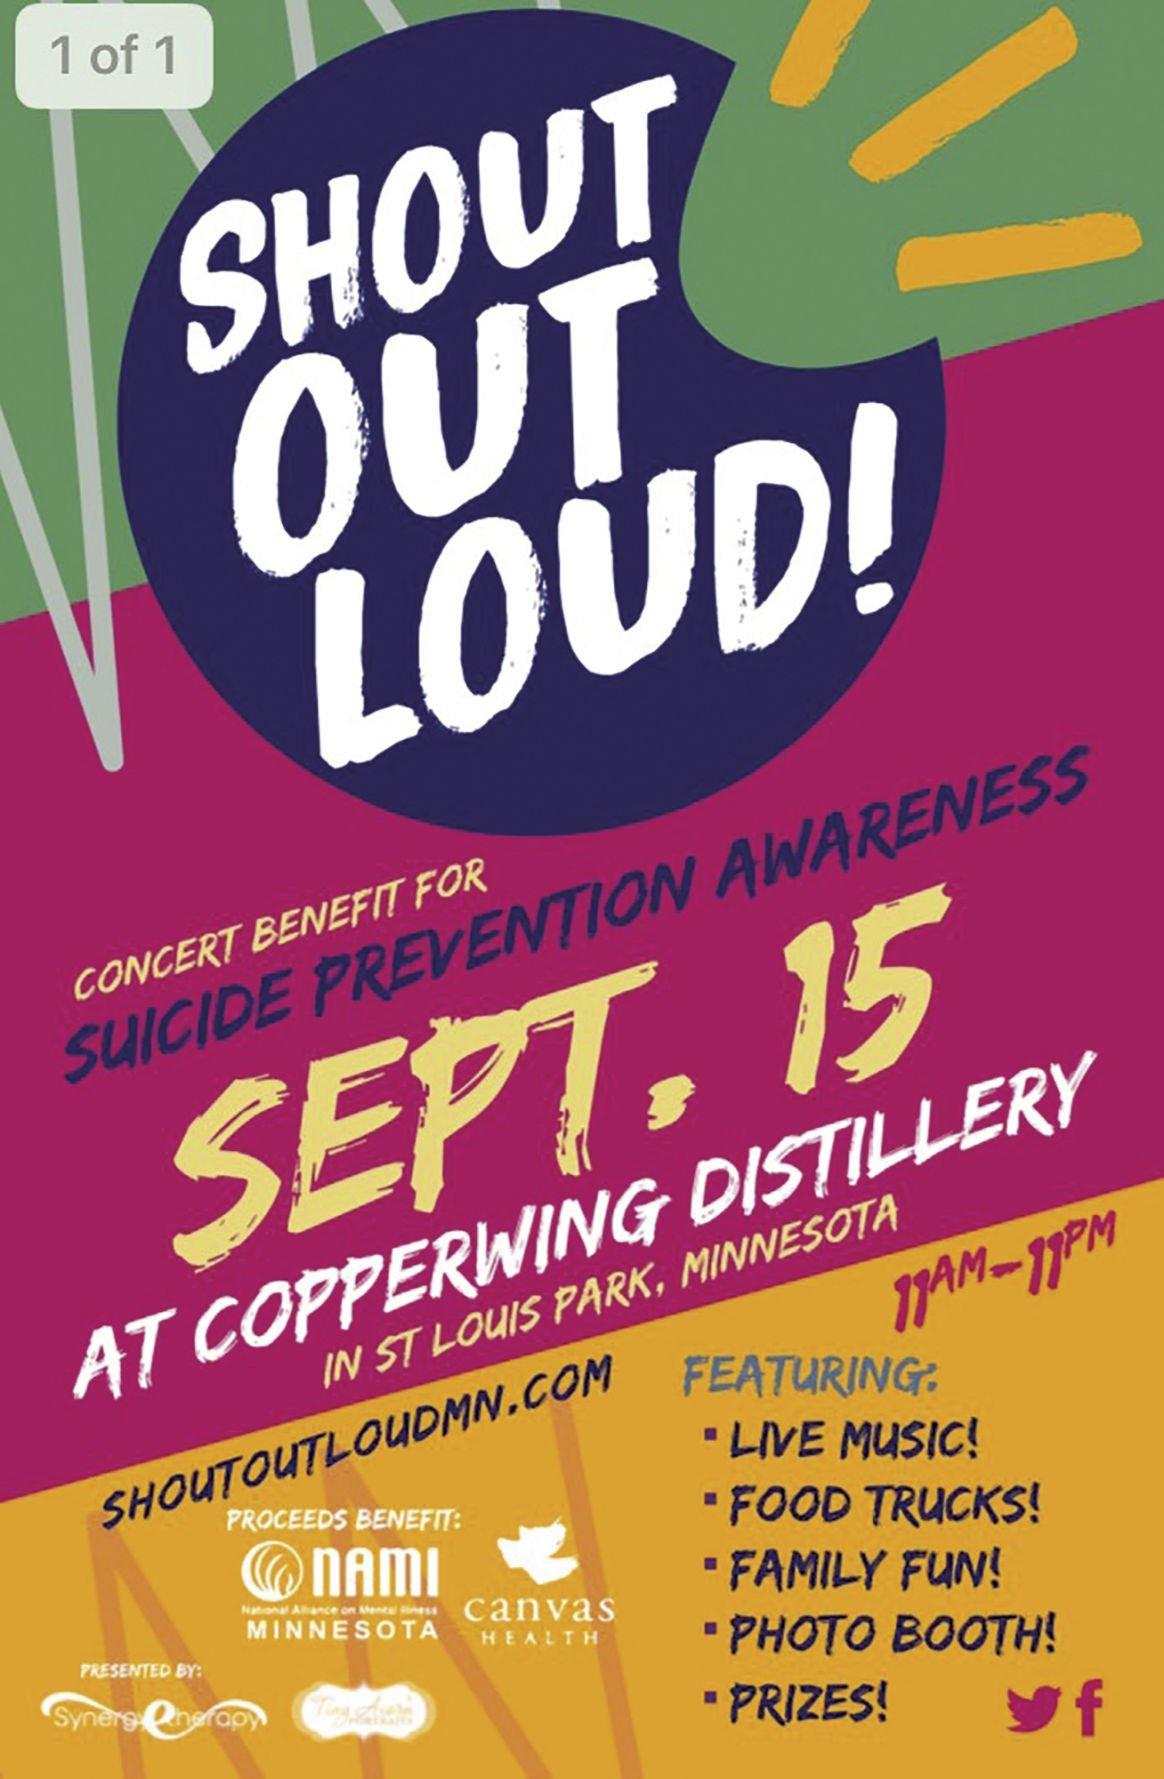 Conversation leads to Sept. 15 Shout Out Loud suicide prevention event in St. Louis Park - 2